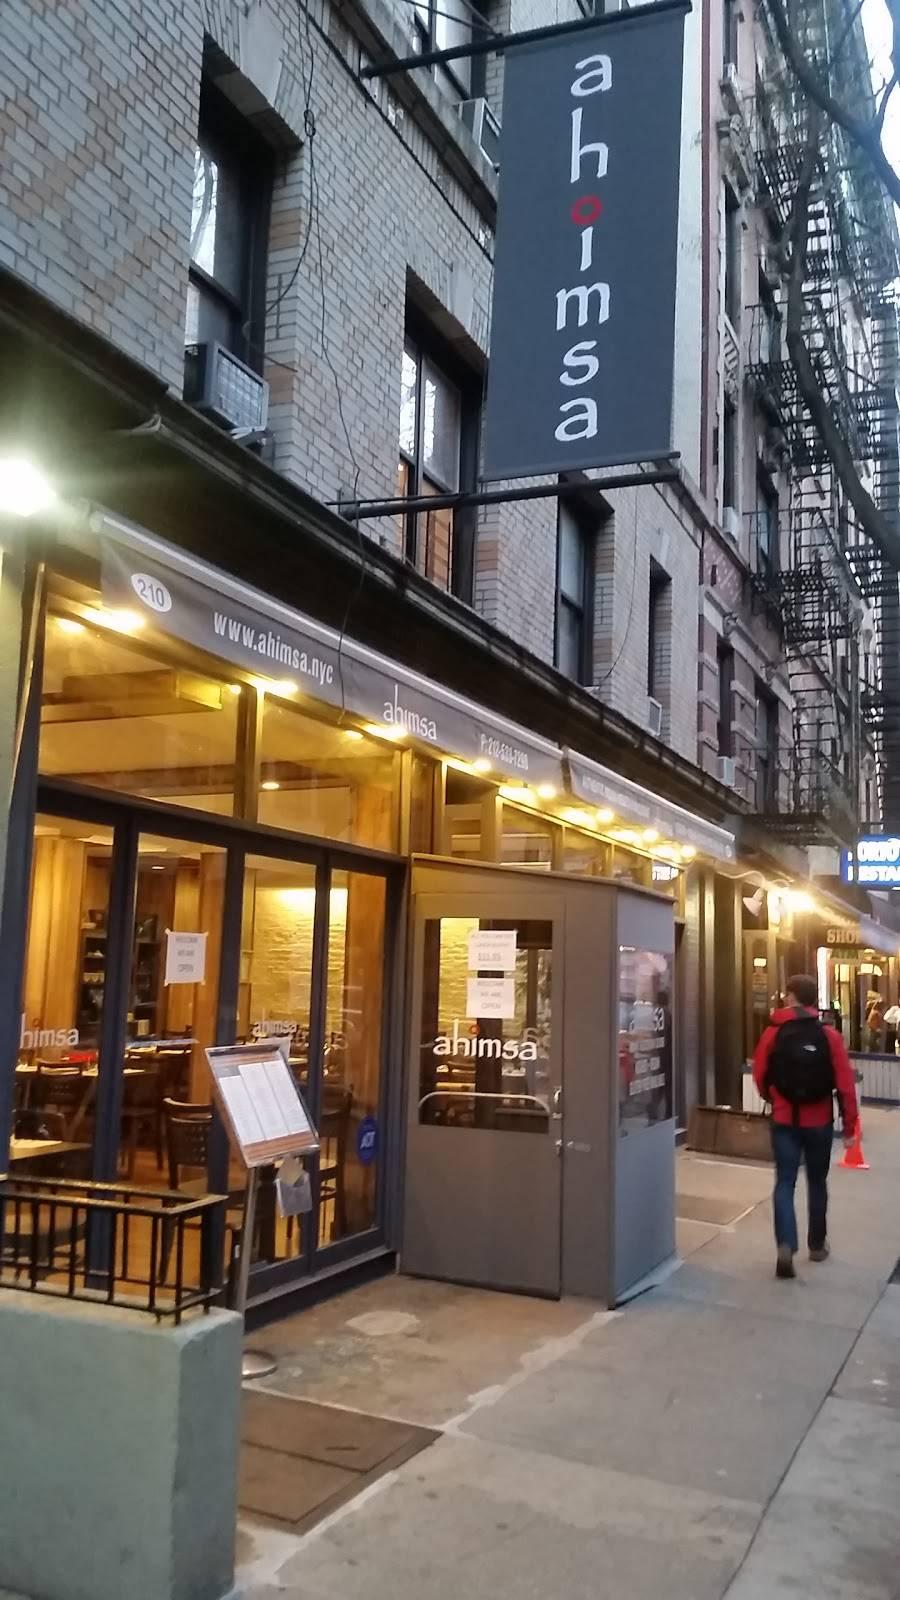 Ahimsa | restaurant | 210 Thompson St, New York, NY 10012, USA | 2125337290 OR +1 212-533-7290